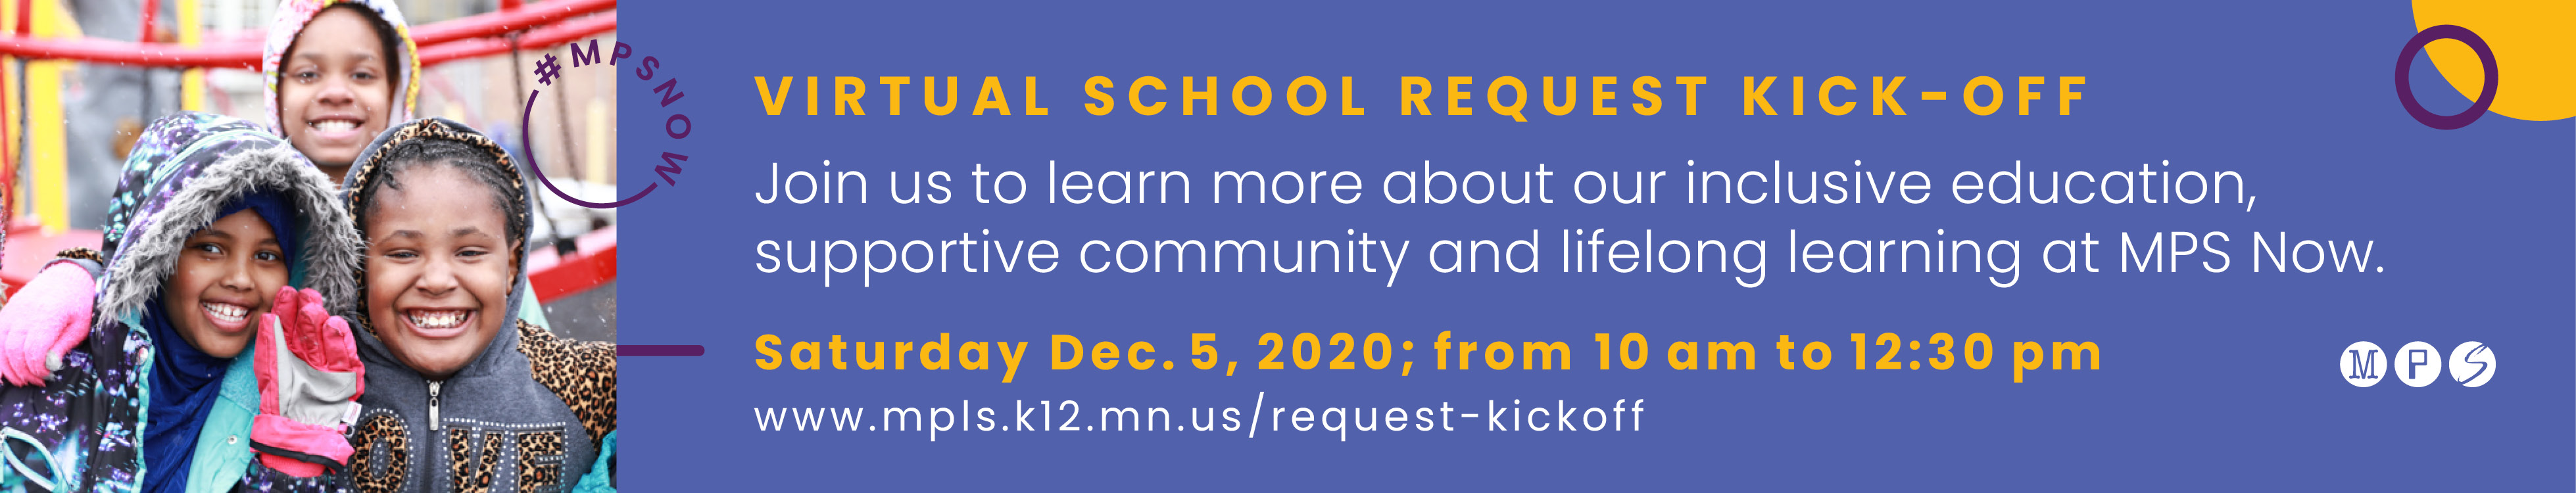 Minneapolis Public Schools Calendar 2021-2022 Relationships, Respect, Readiness, & Responsibility